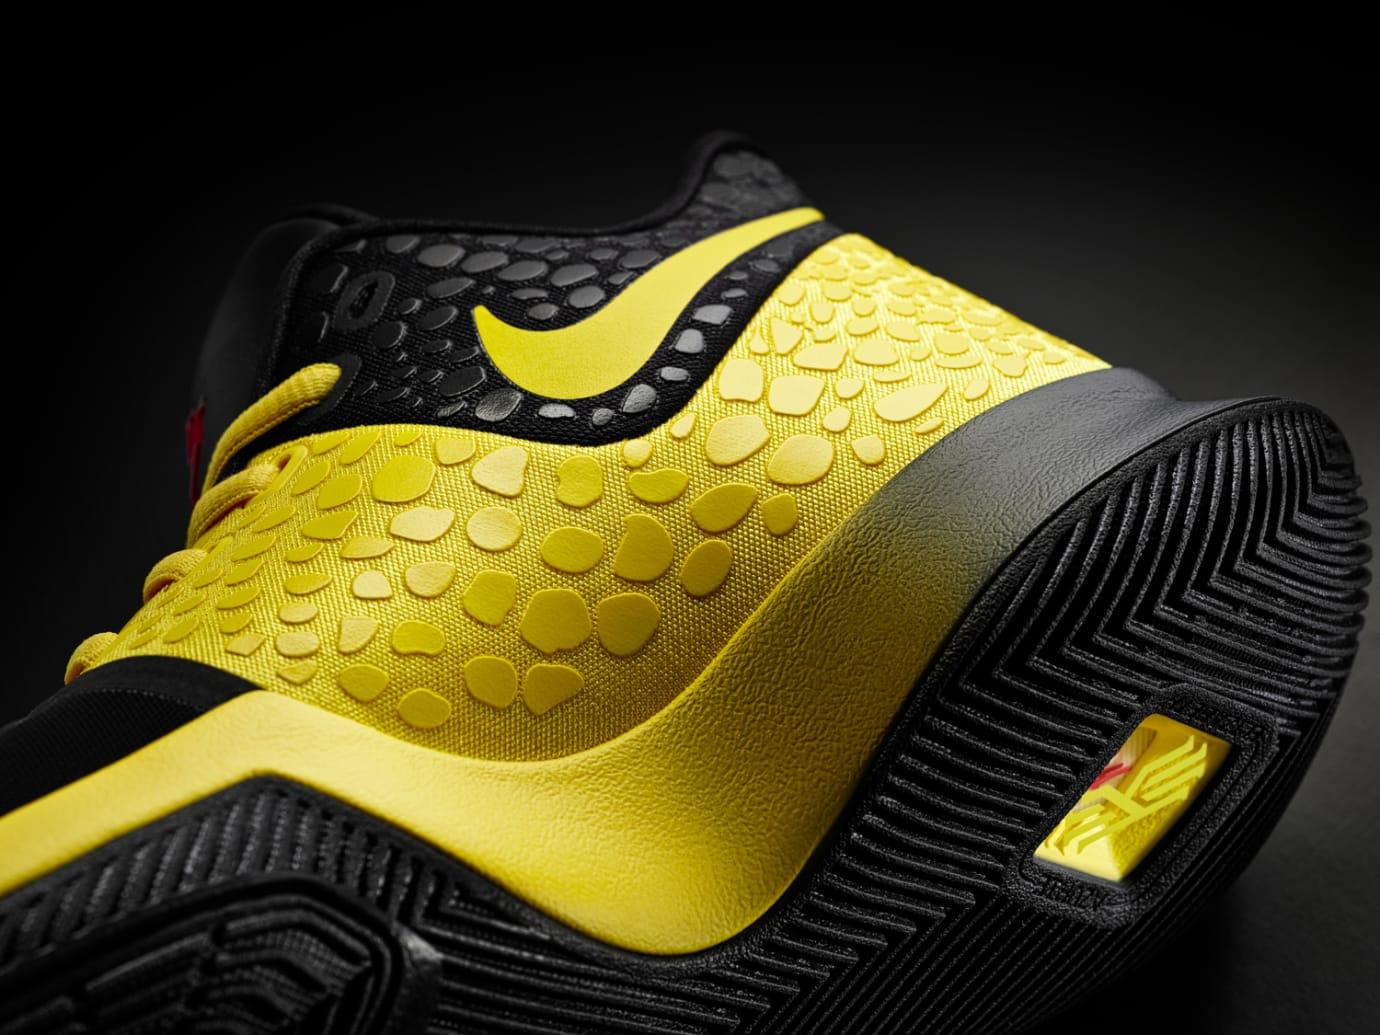 Nike Kyrie 3 Mamba Mentality Bruce Lee Medial